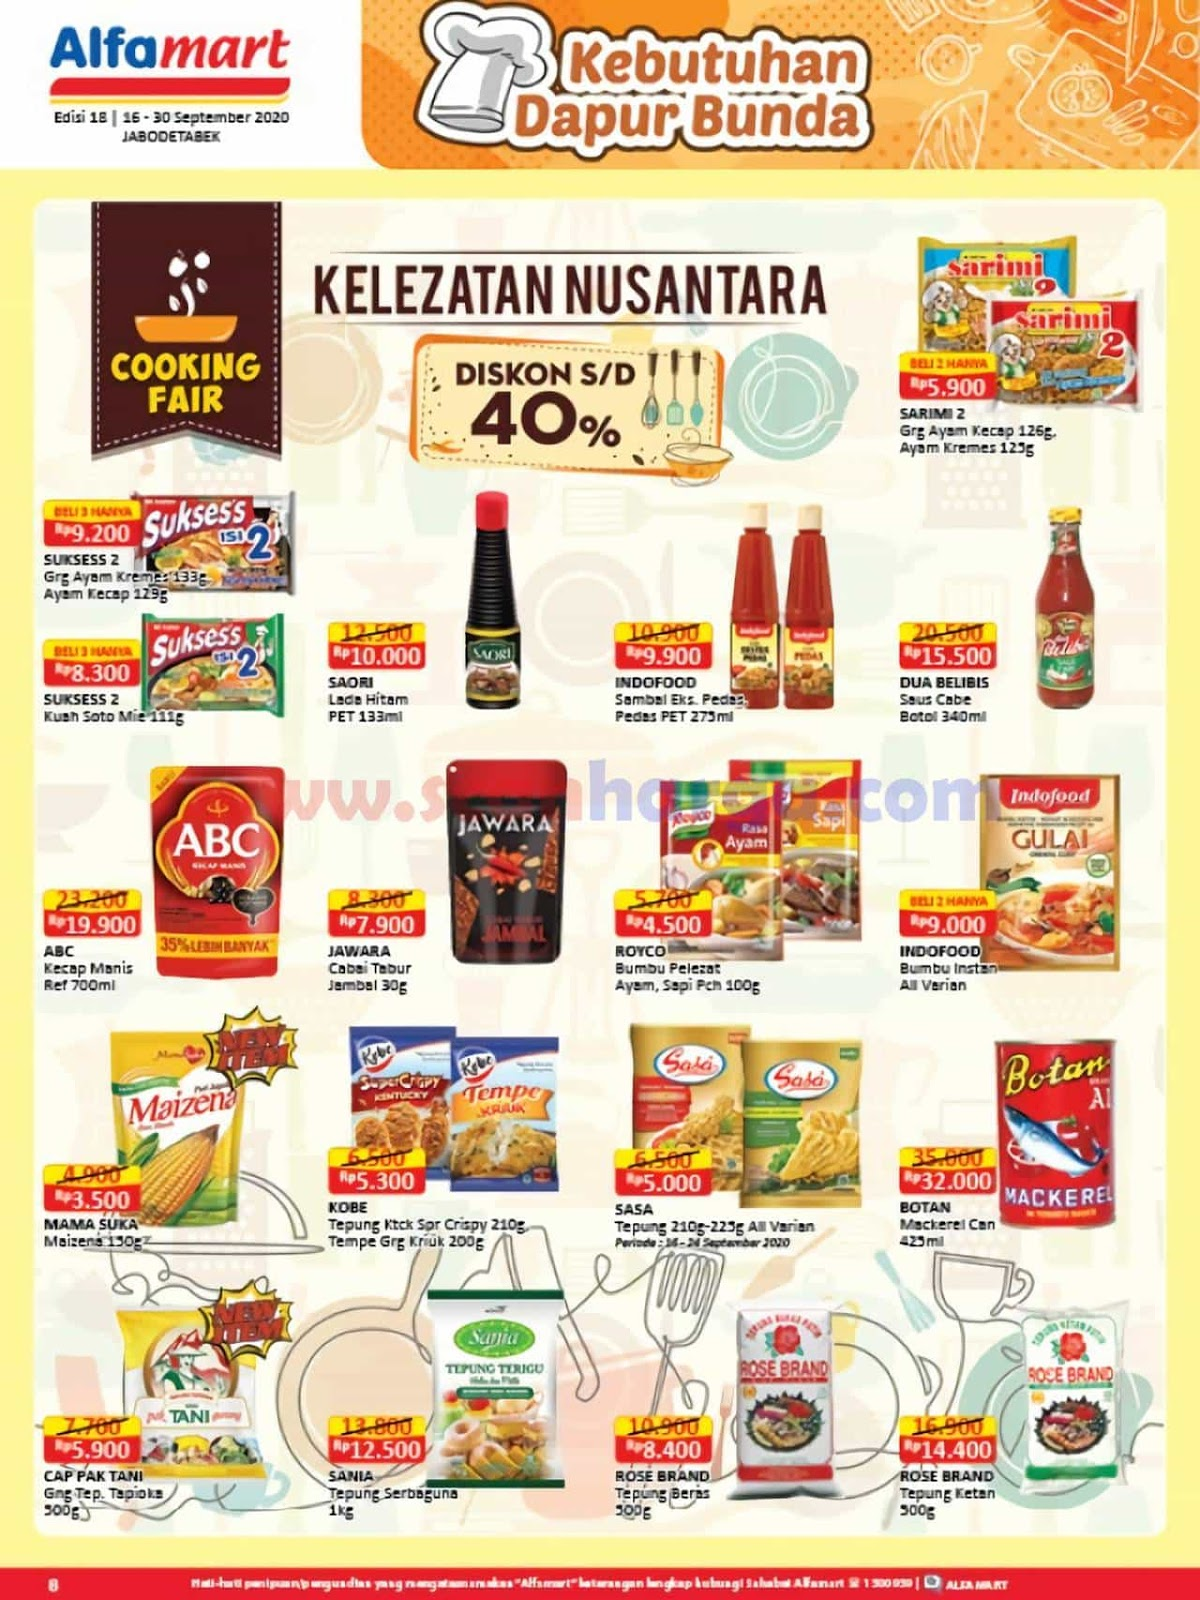 Katalog Promo Alfamart 16 - 30 September 2020 8